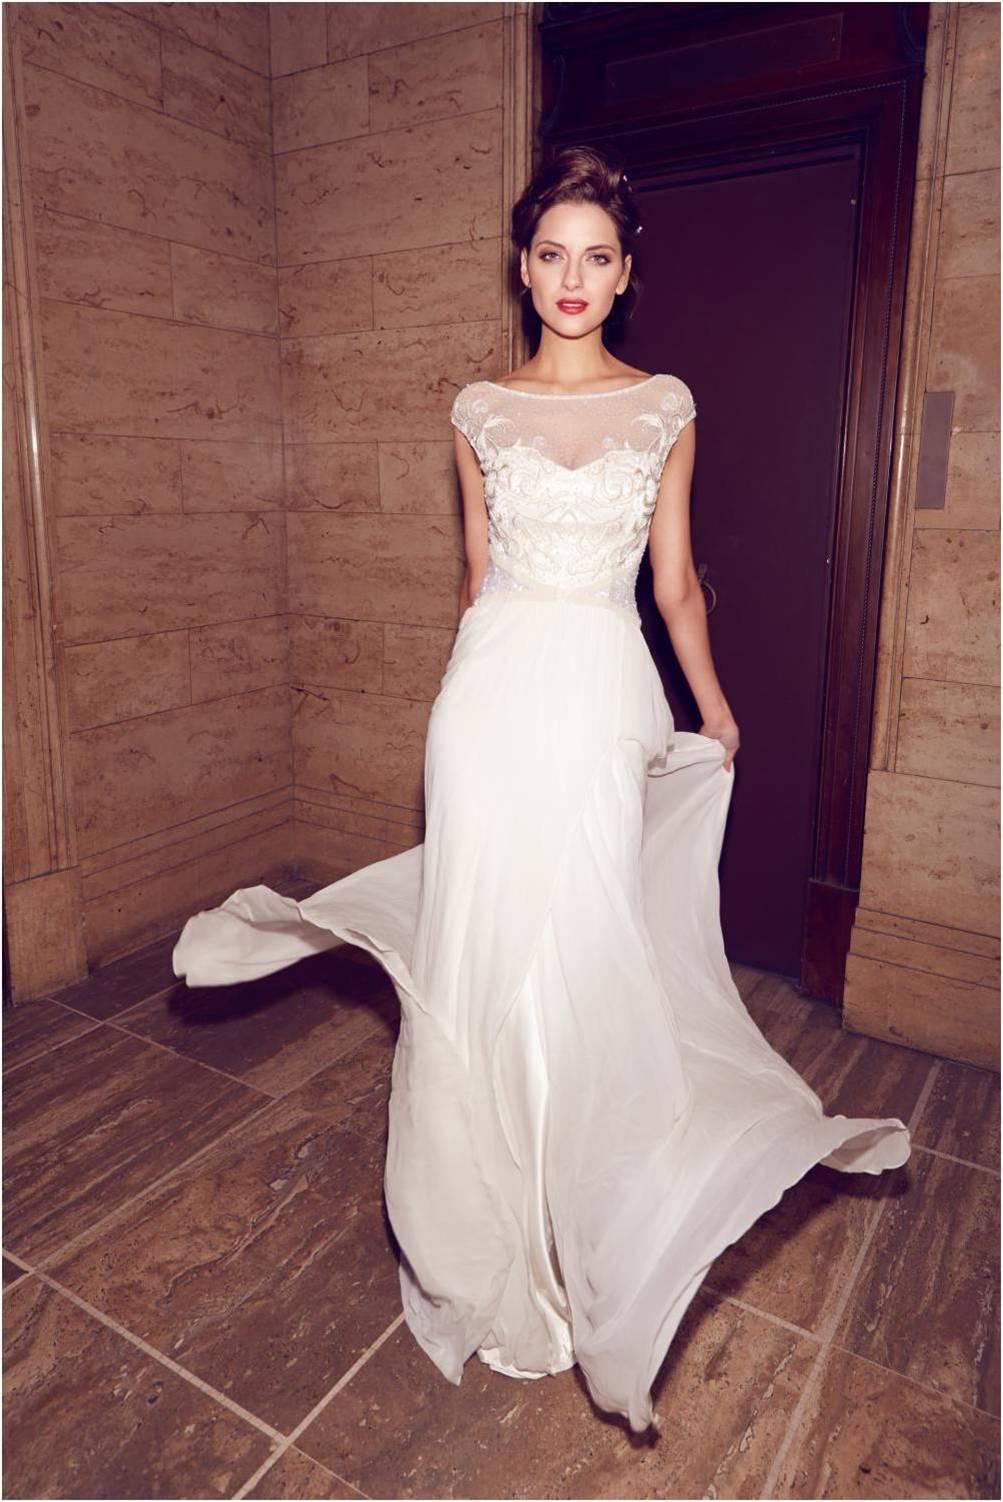 Karen willis holmes wedding dresses 2014 for Wedding dress instagram